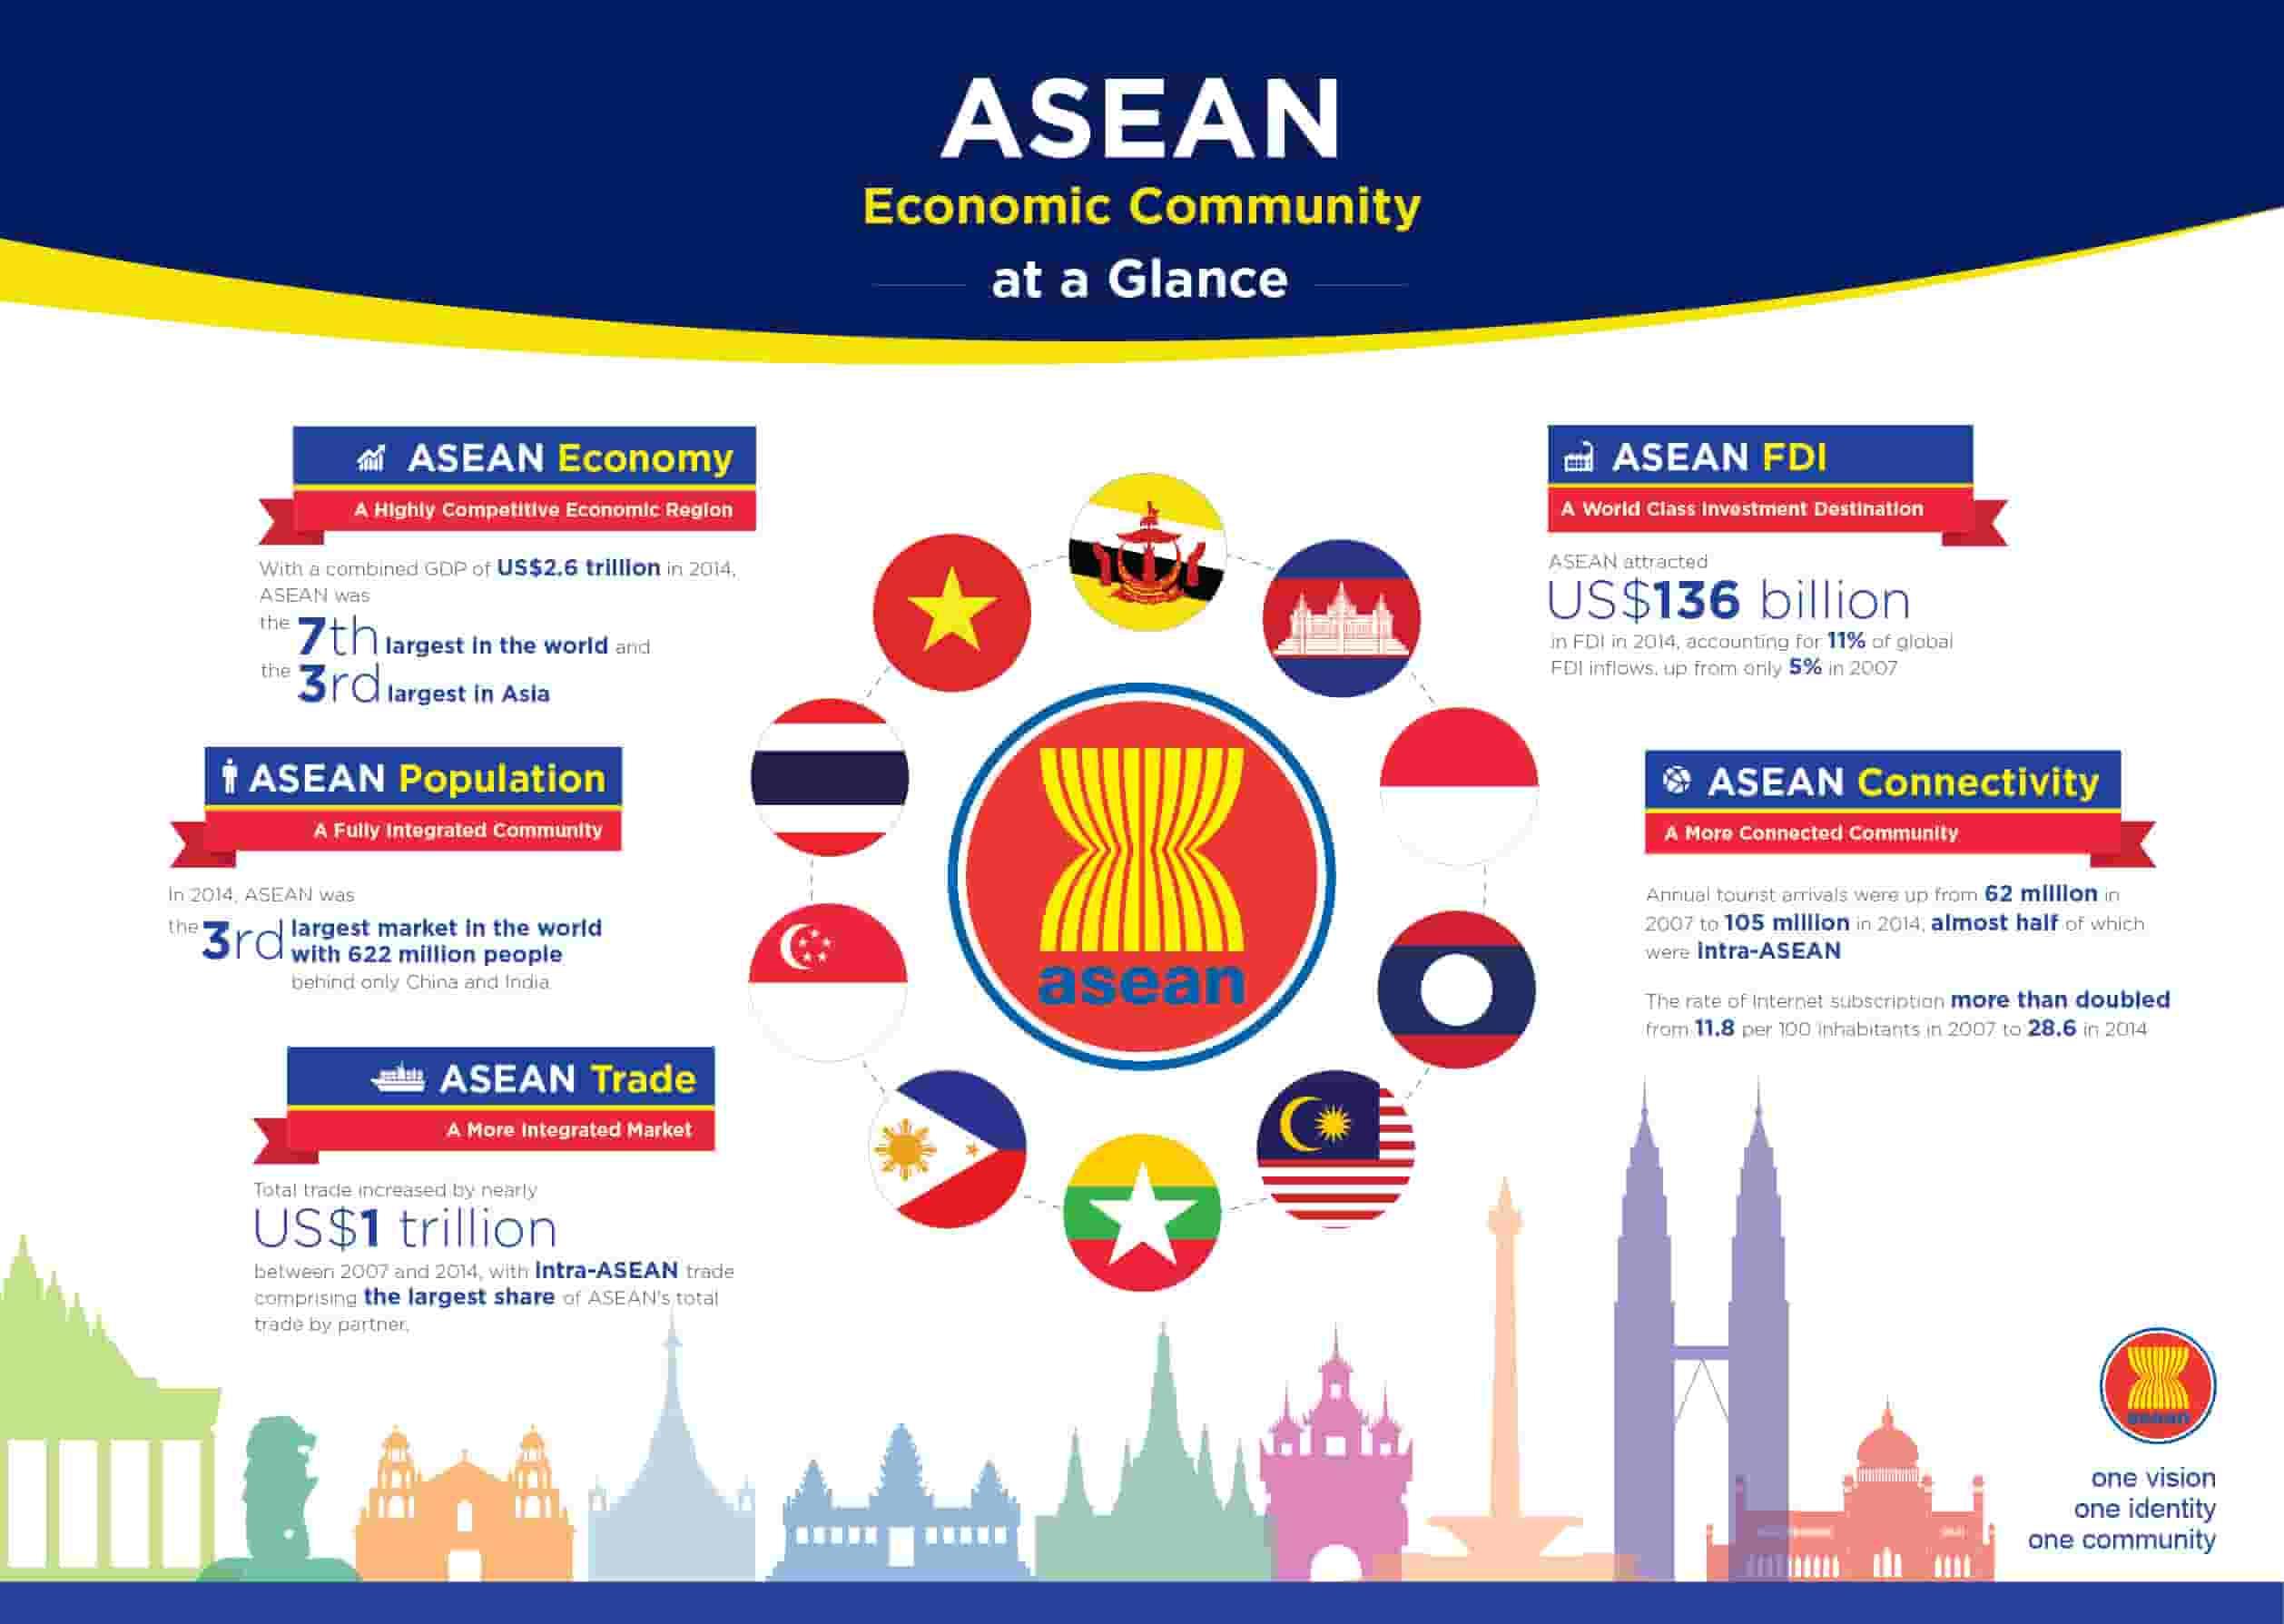 communauté-ASEAN